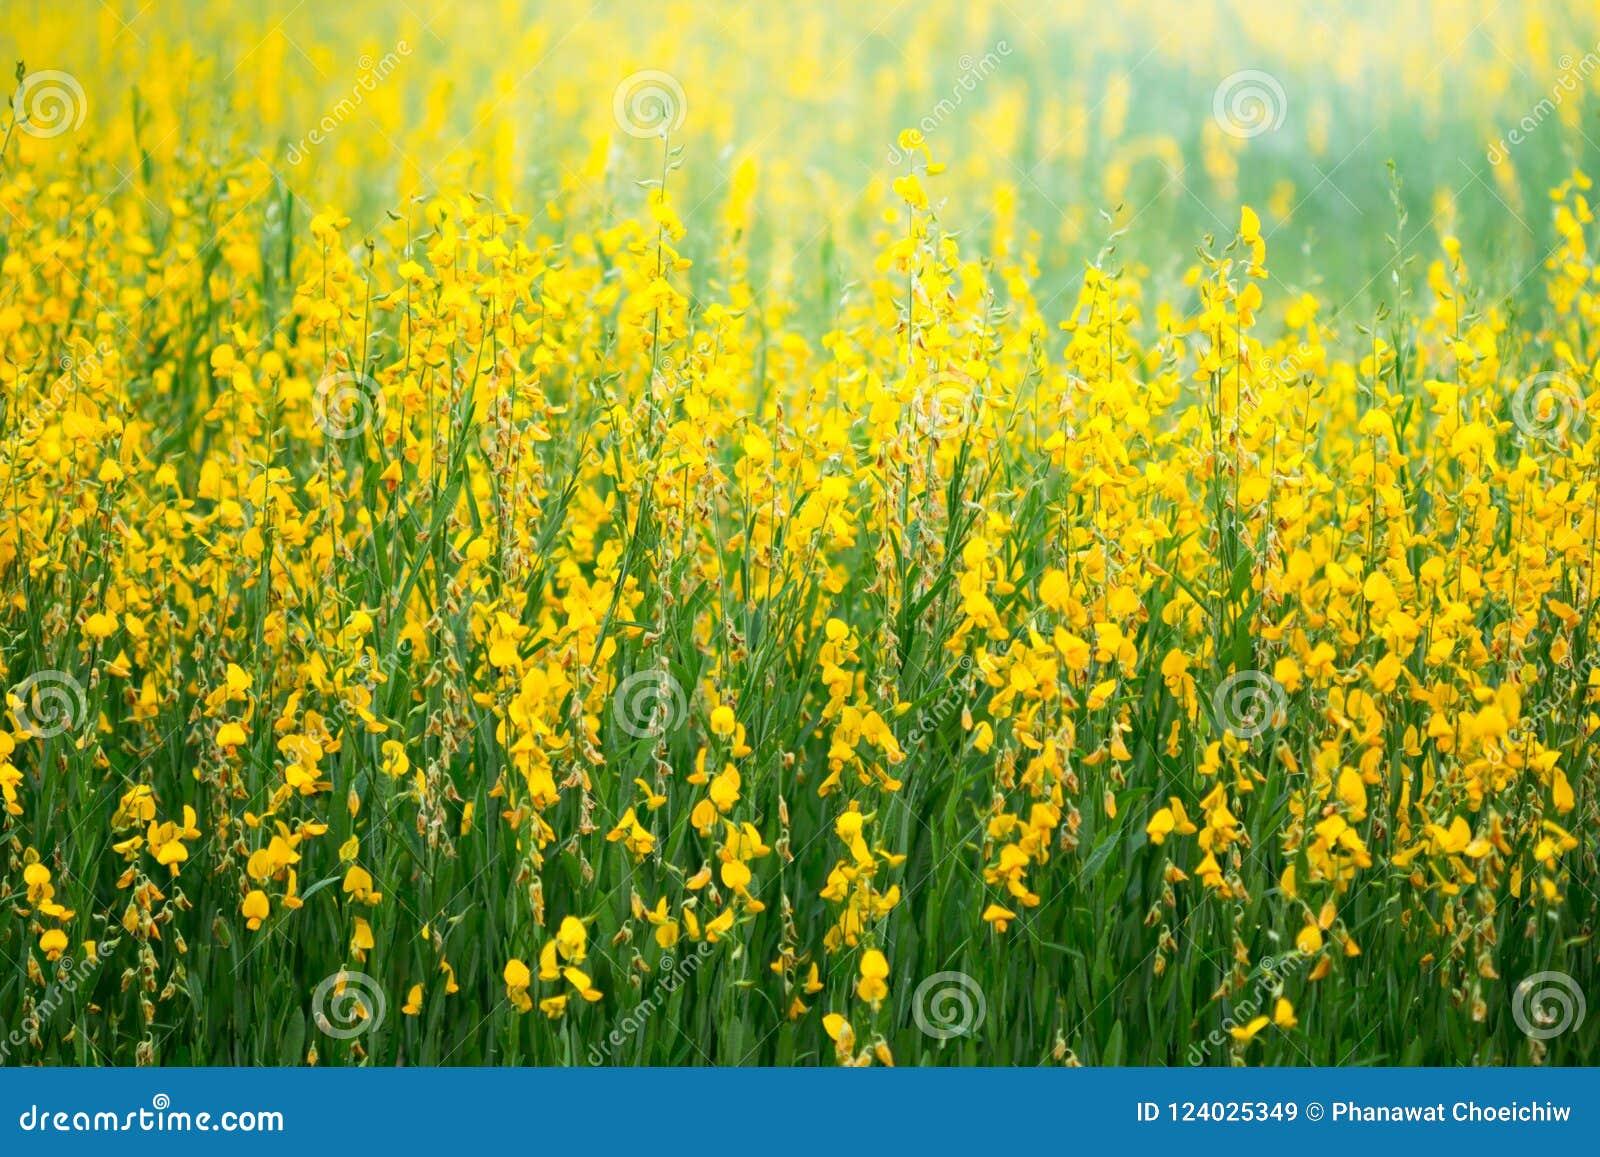 Farm Of Crotalaria Flowerbeautiful Crotalaria Stock Image Image